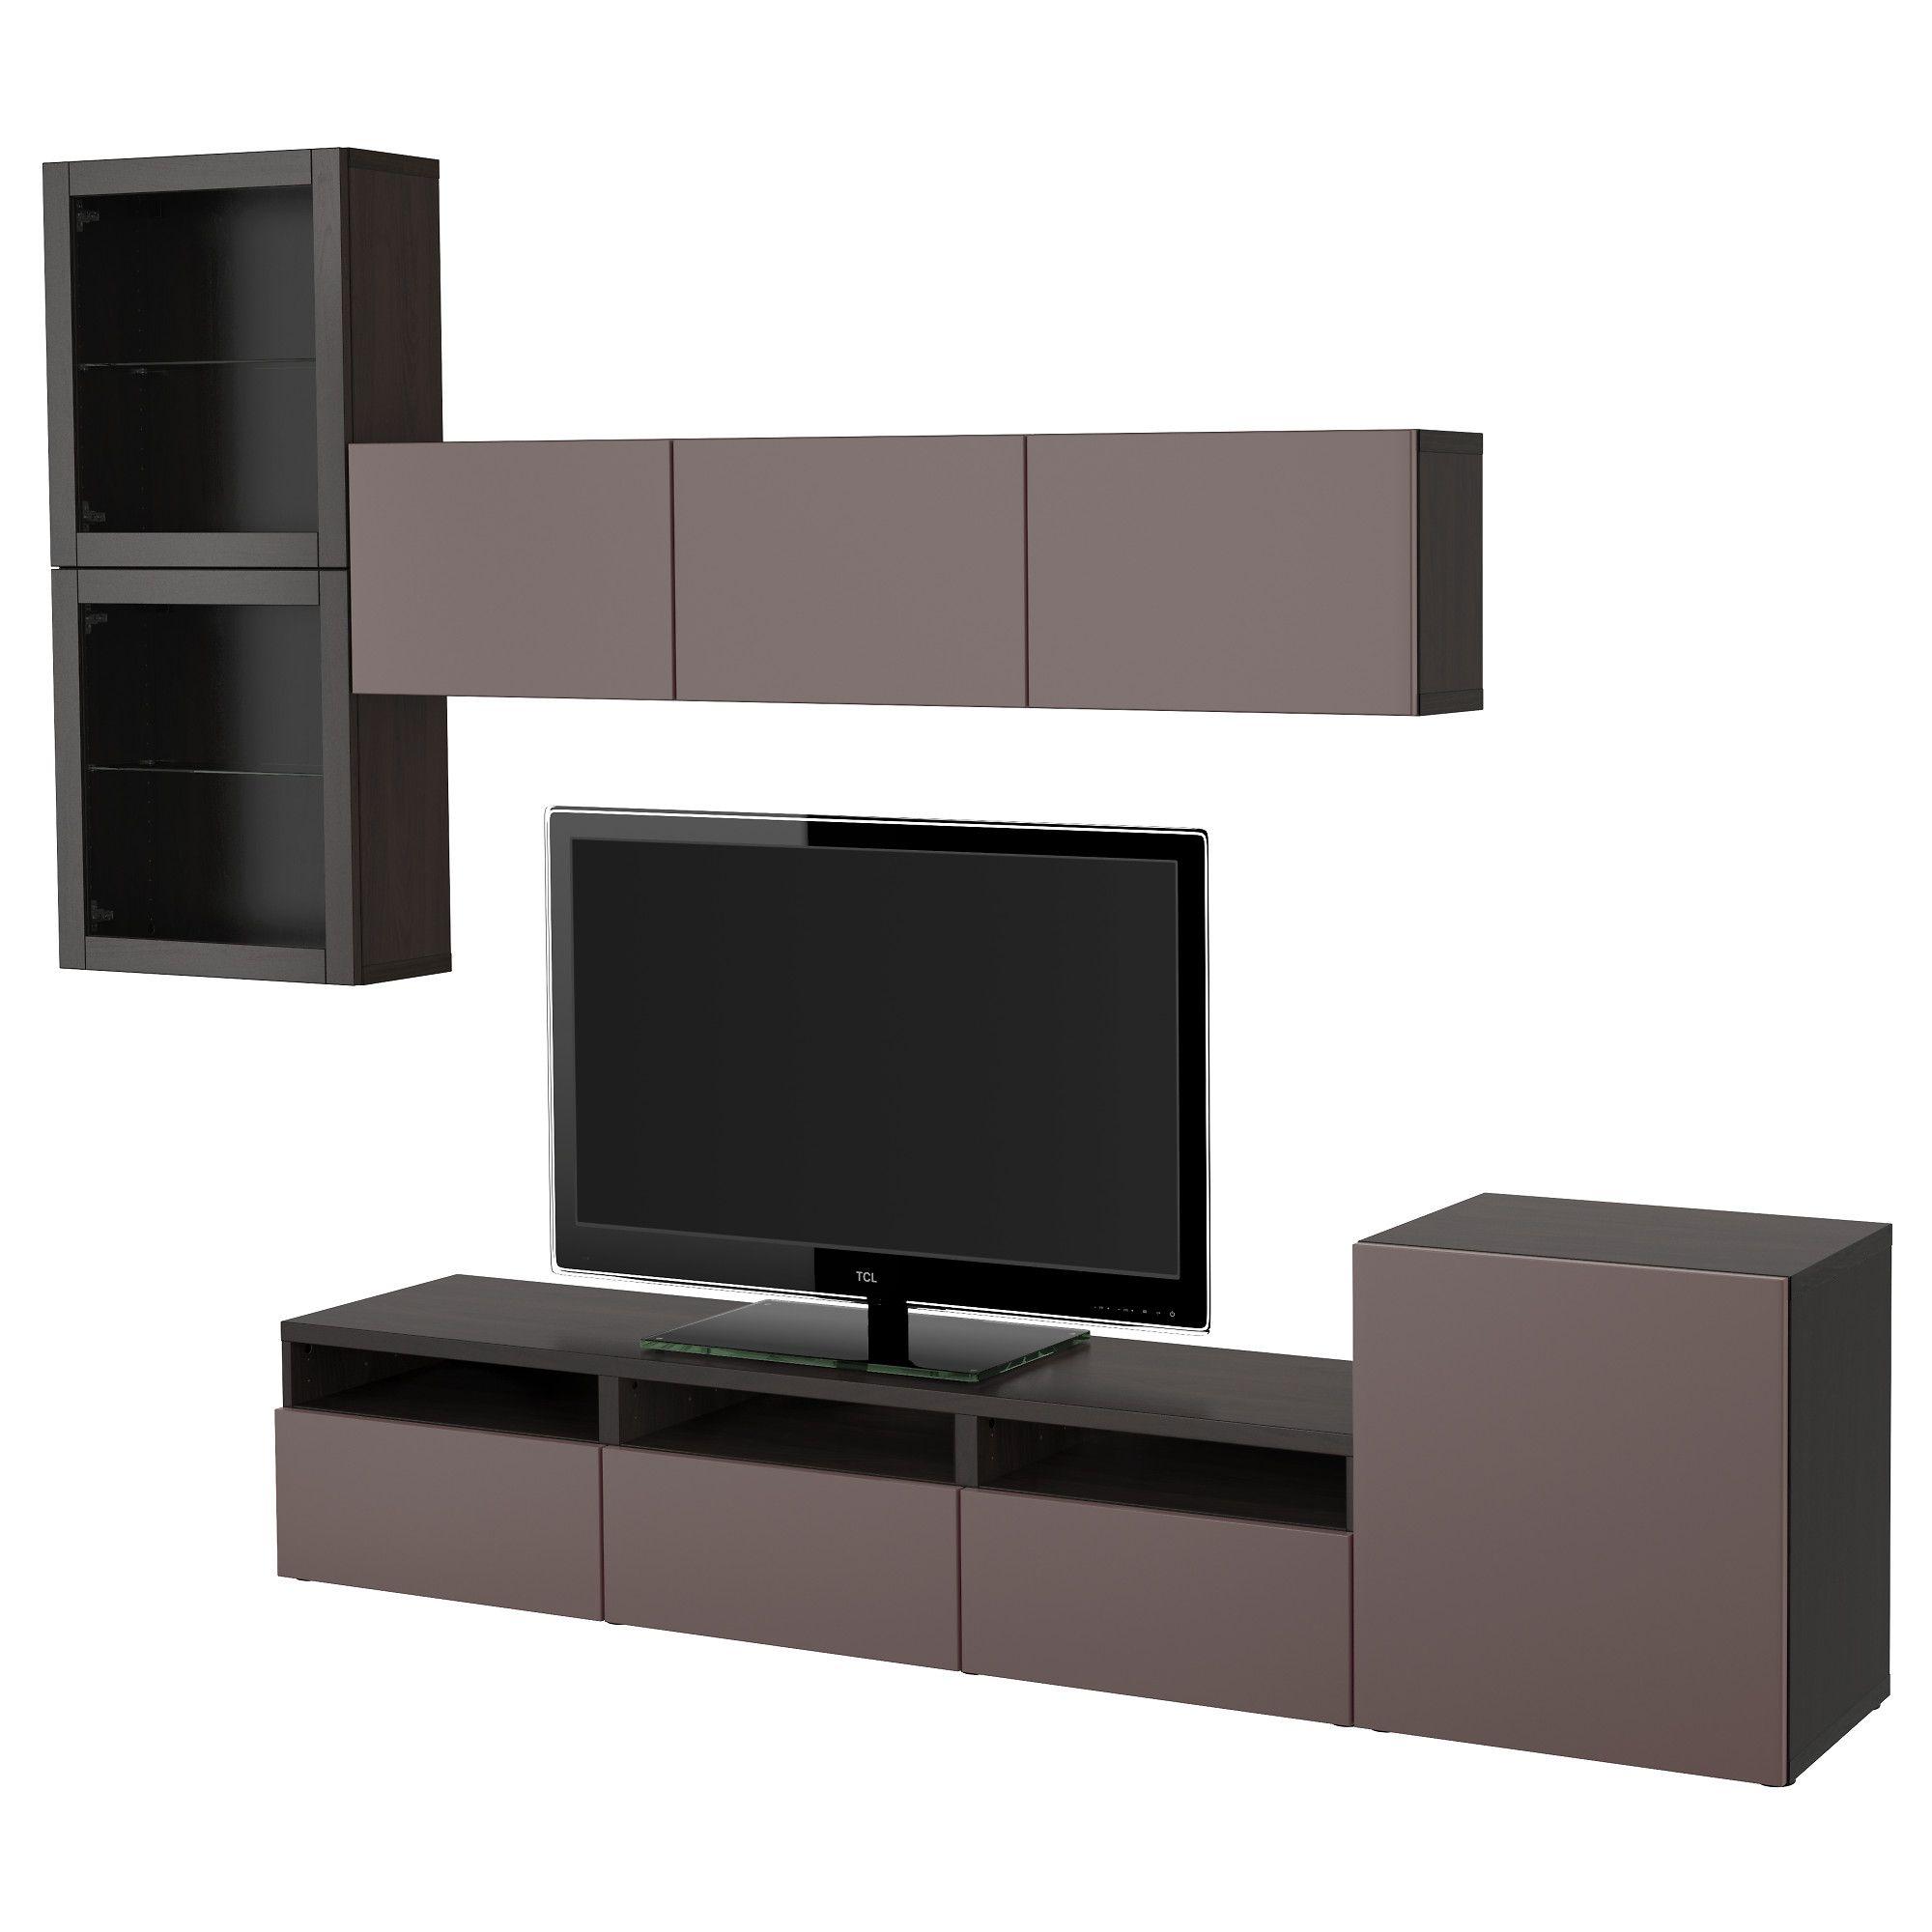 Pin by ladendirekt on TVHiFiMöbel Tv storage, Ikea, Tv